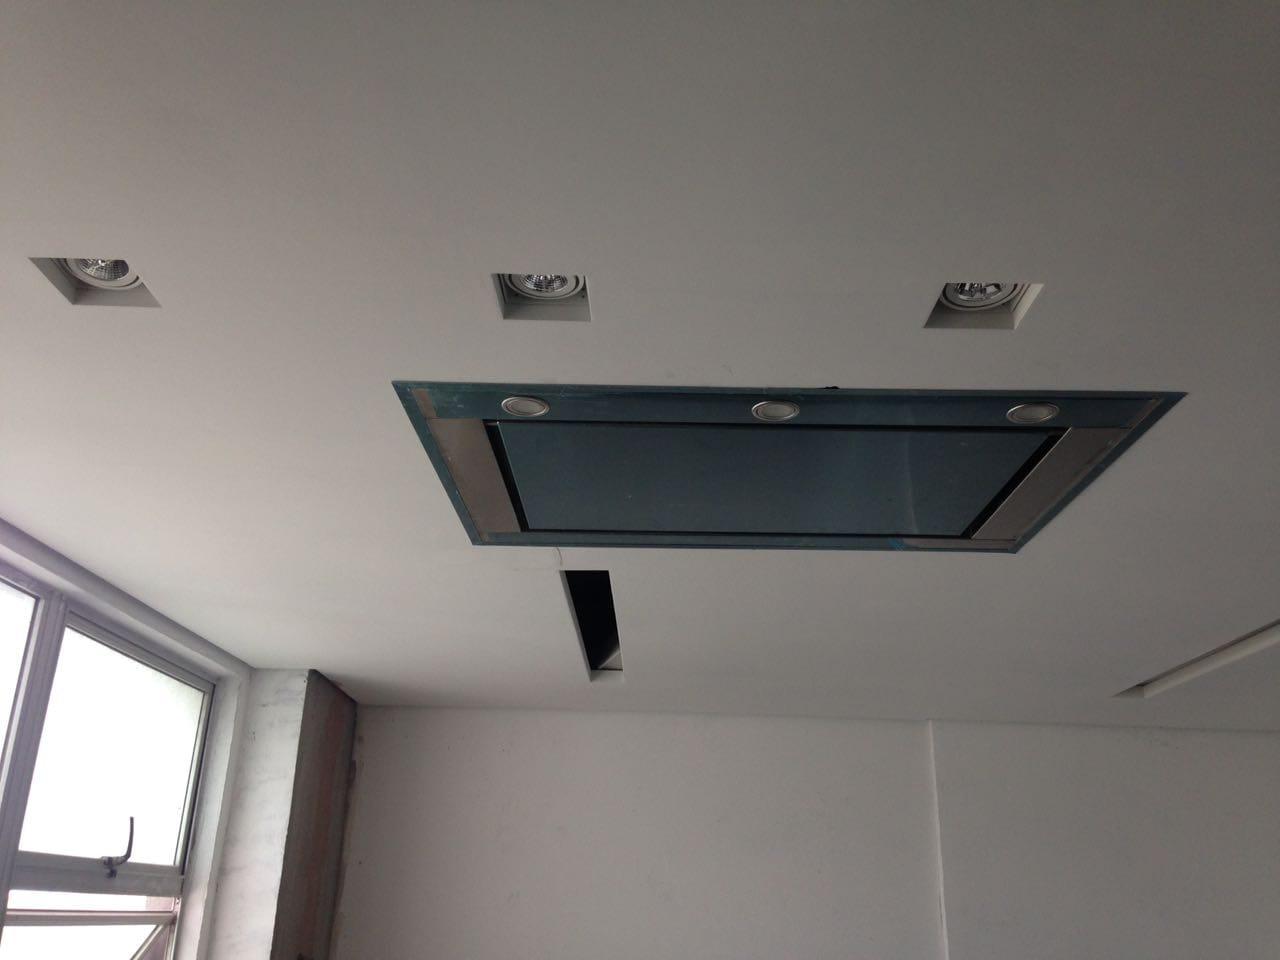 Coifa  de Embutir no teto Inox  130cm - Art & Design Premium